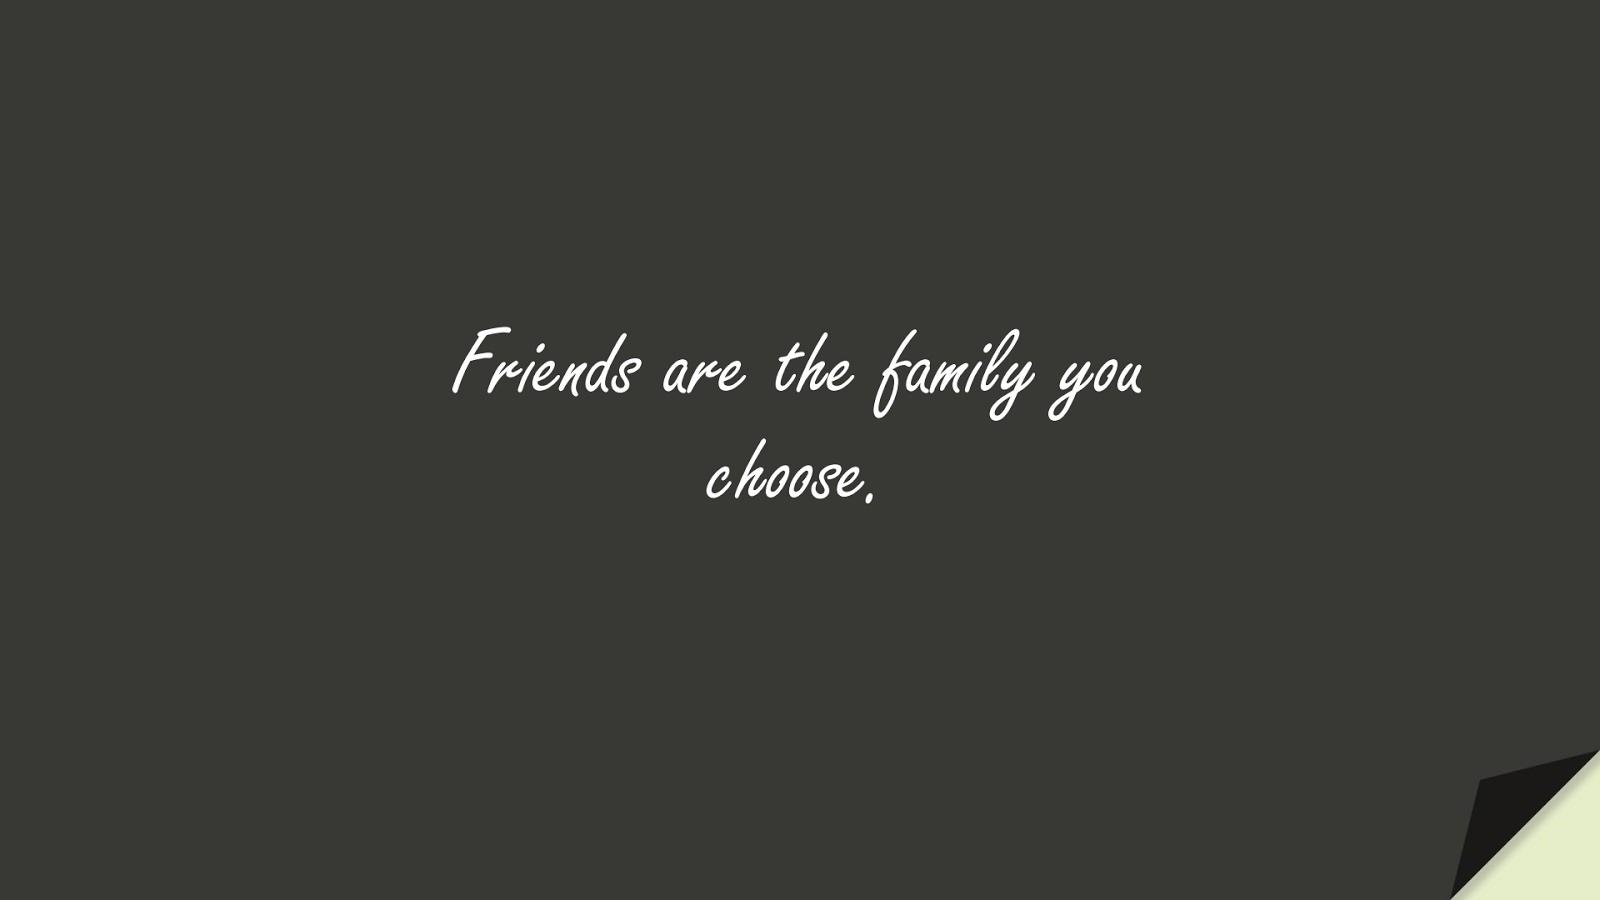 Friends are the family you choose.FALSE